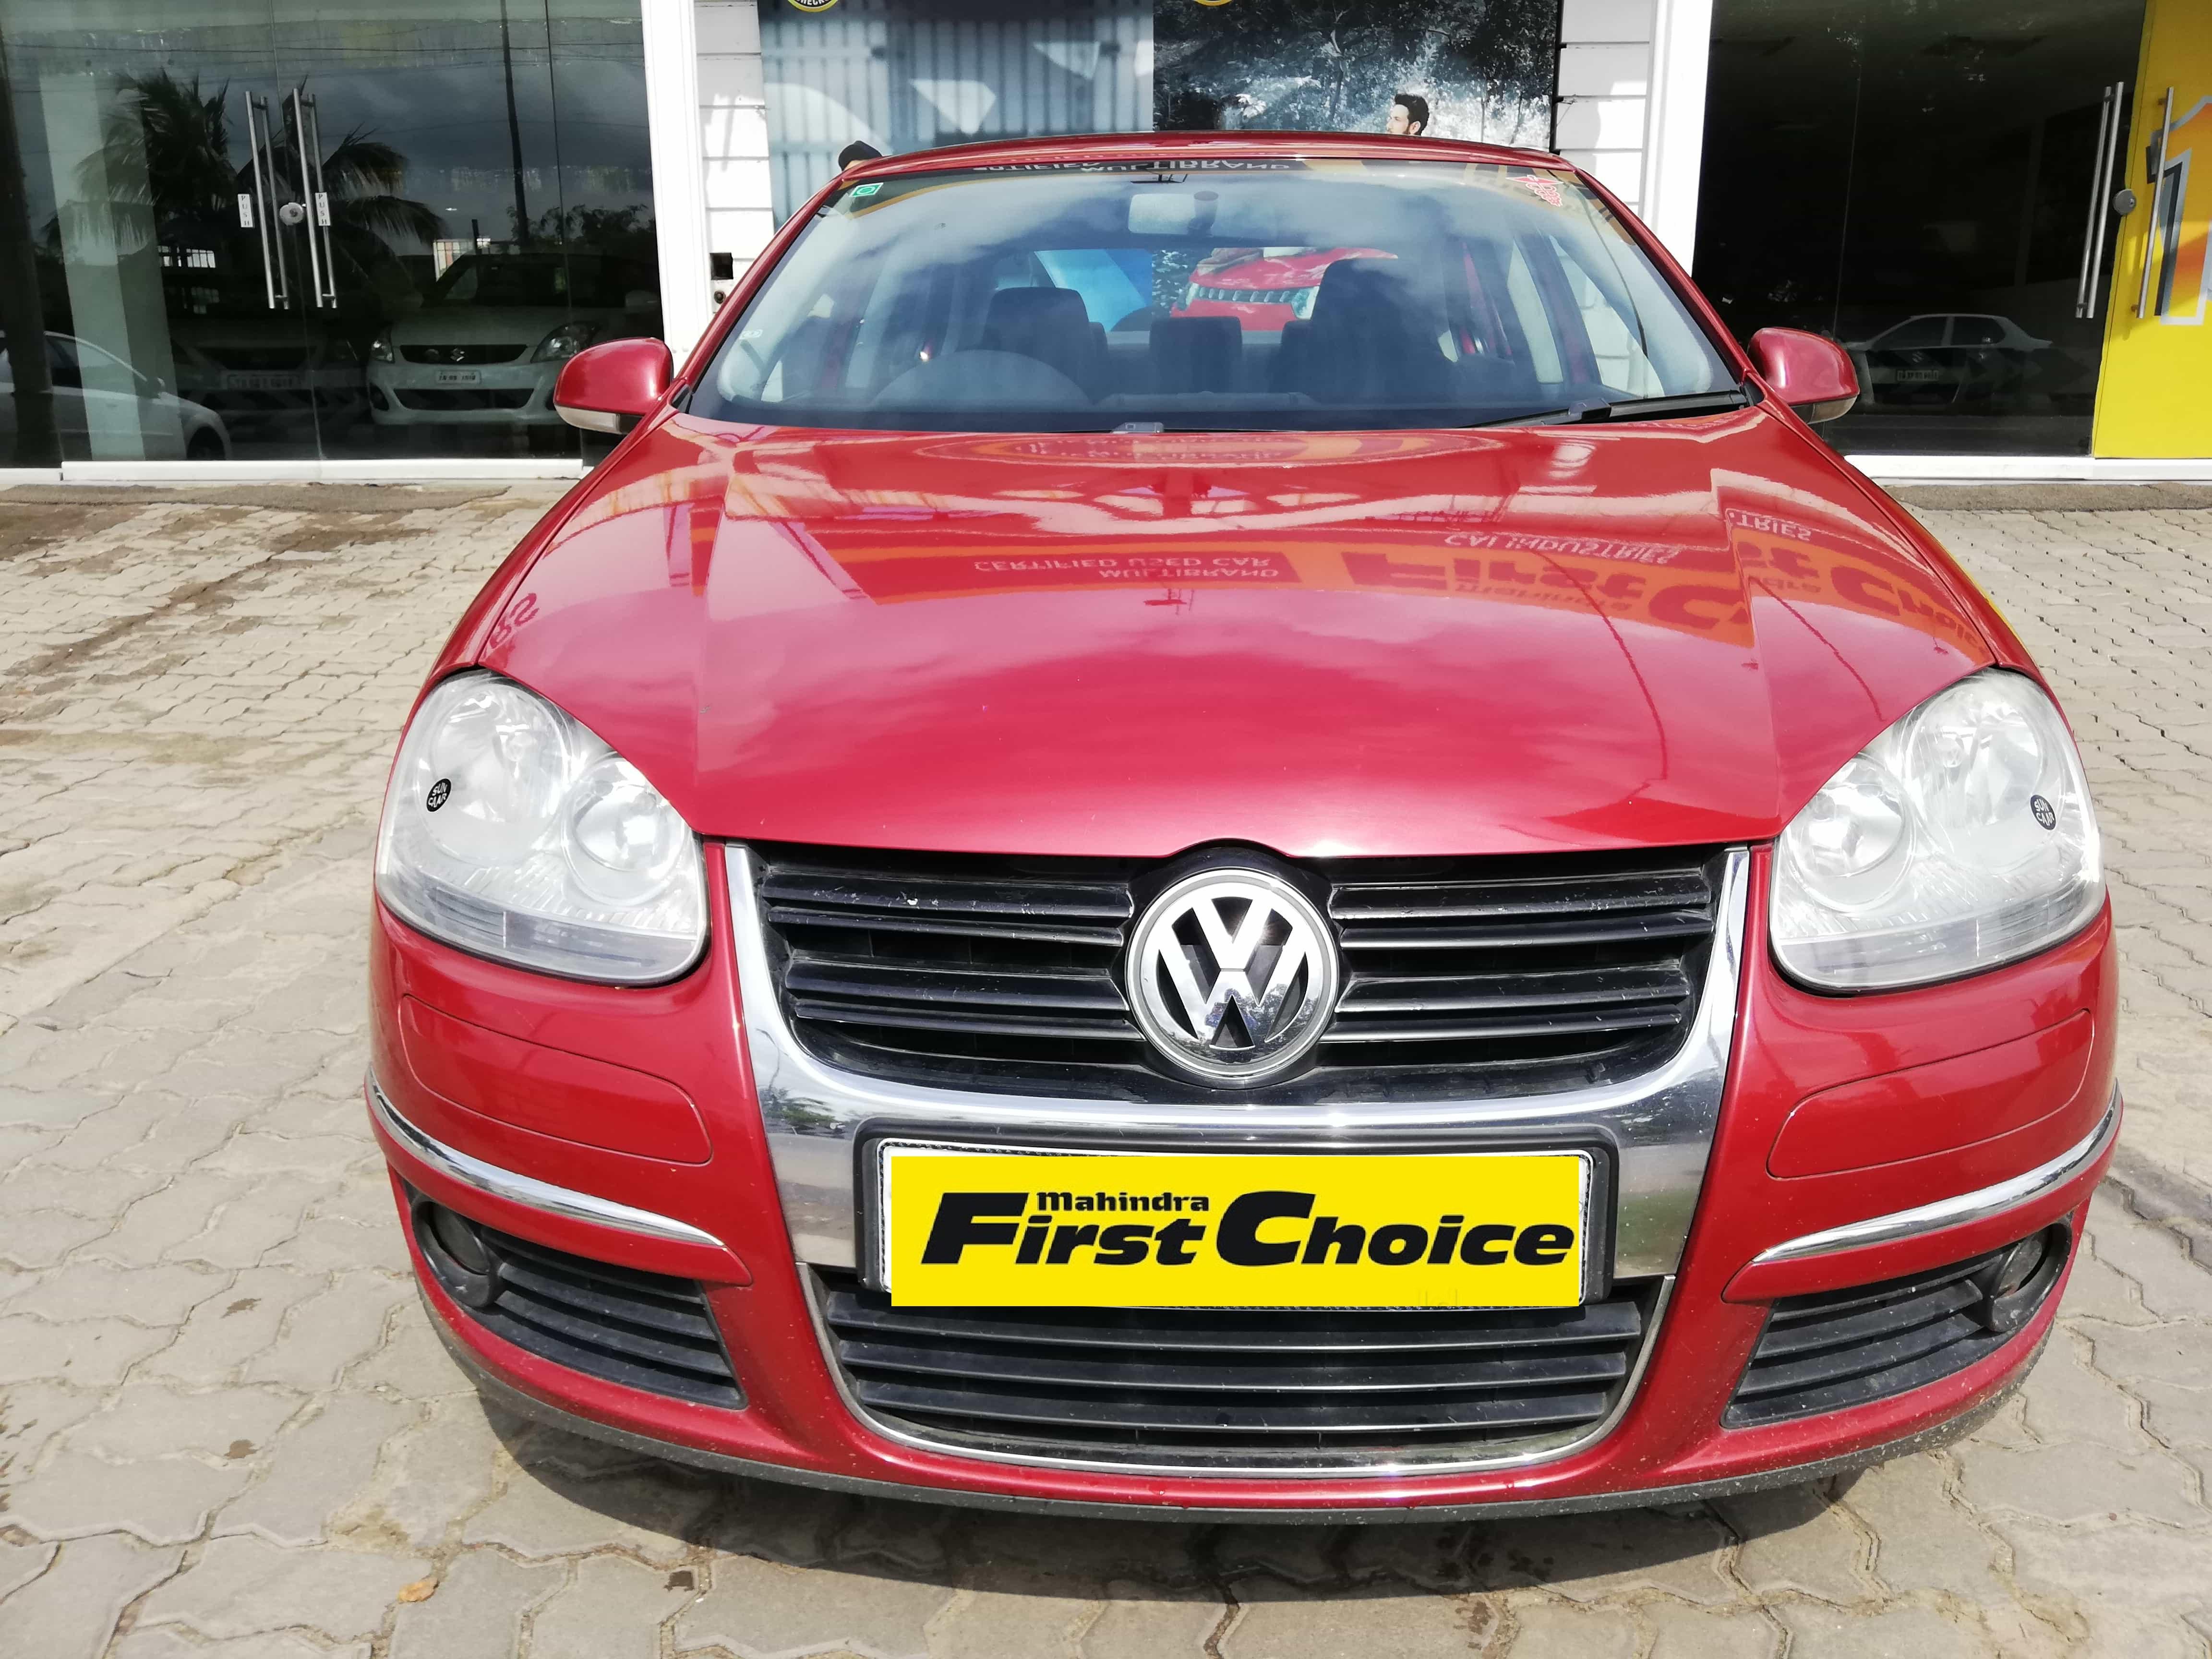 2009 Used Volkswagen Jetta HIGHLINE TDI